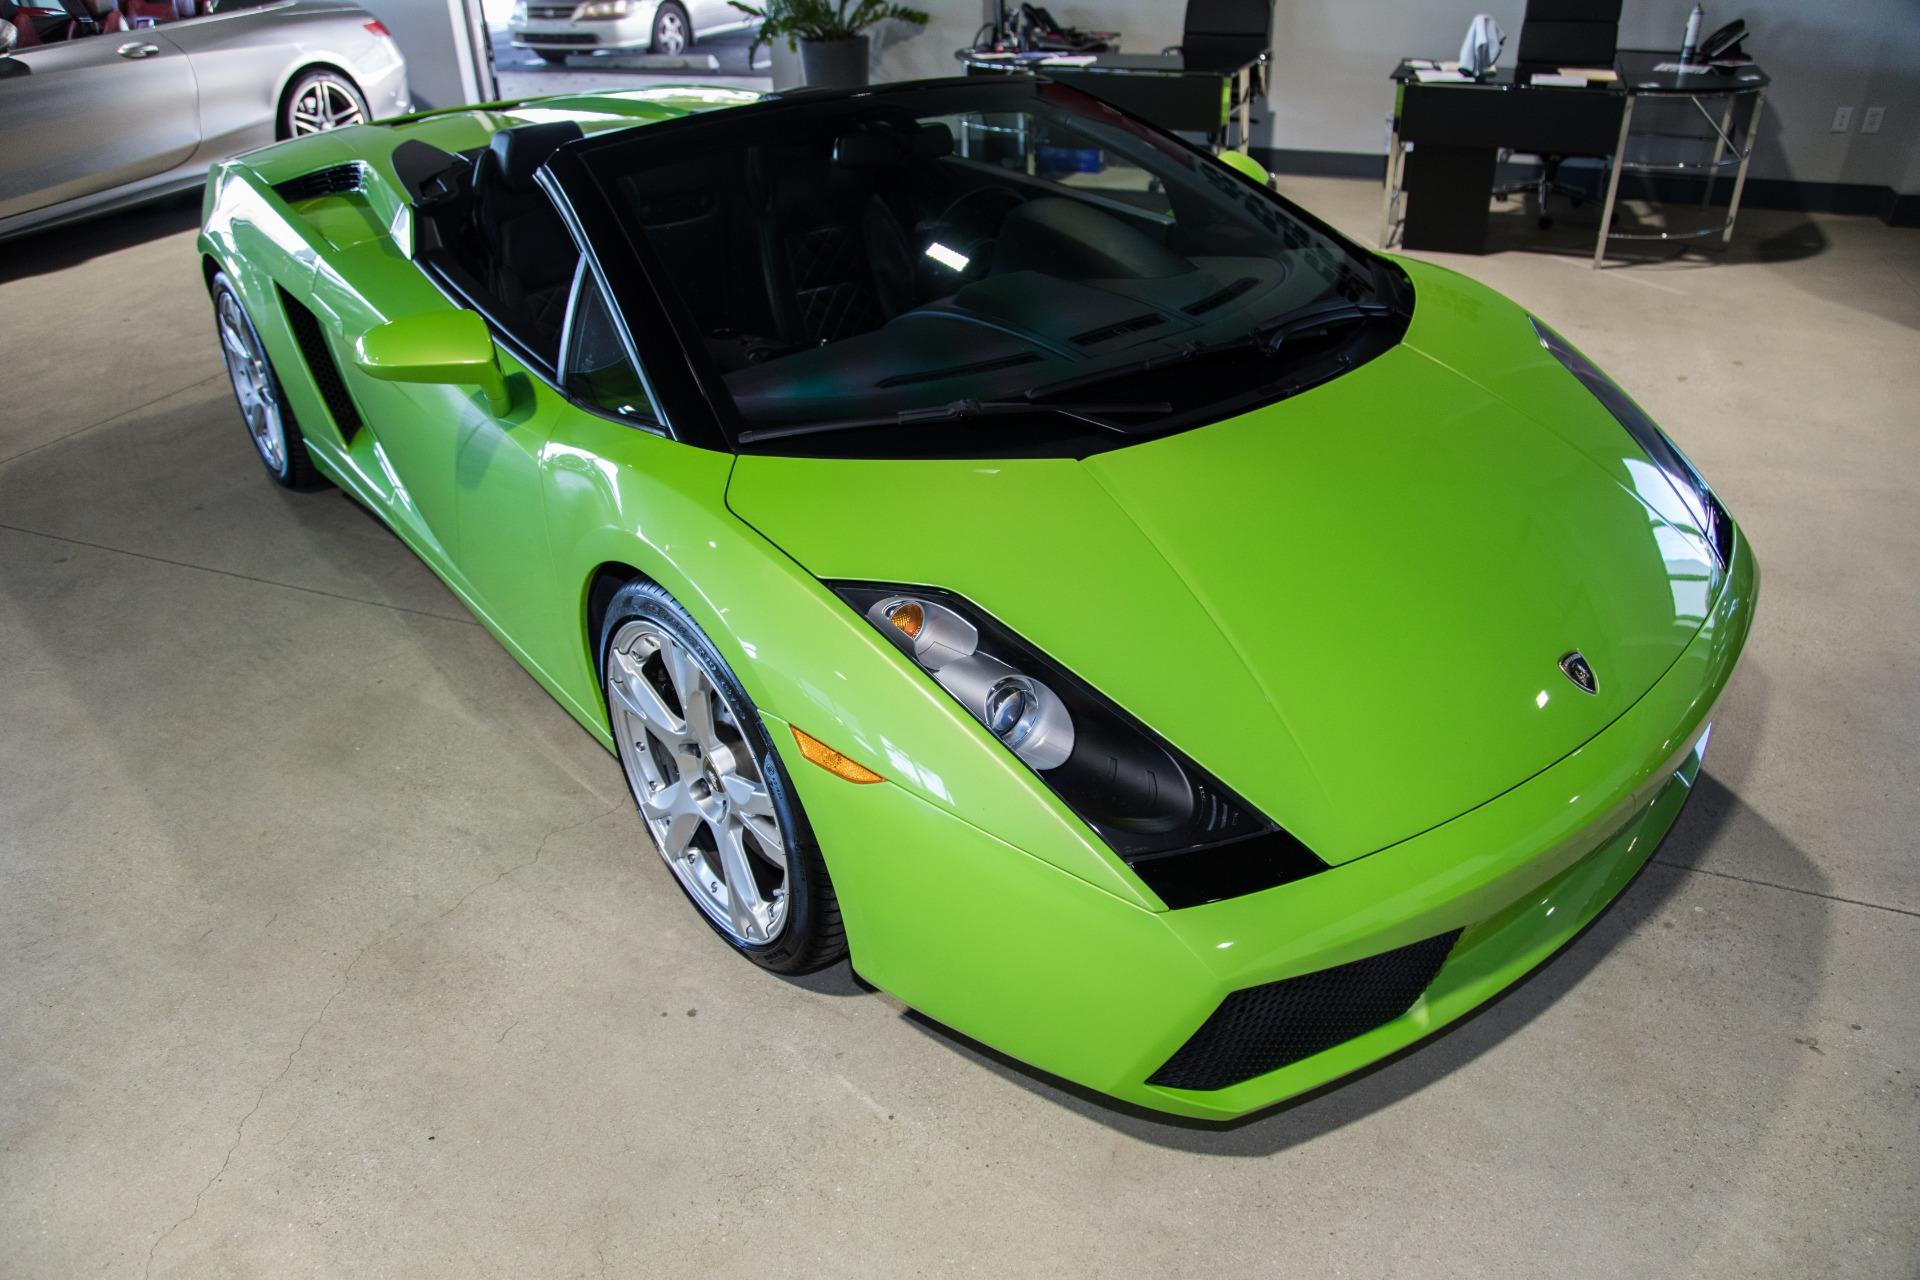 Used-2008-Lamborghini-Gallardo-Spyder